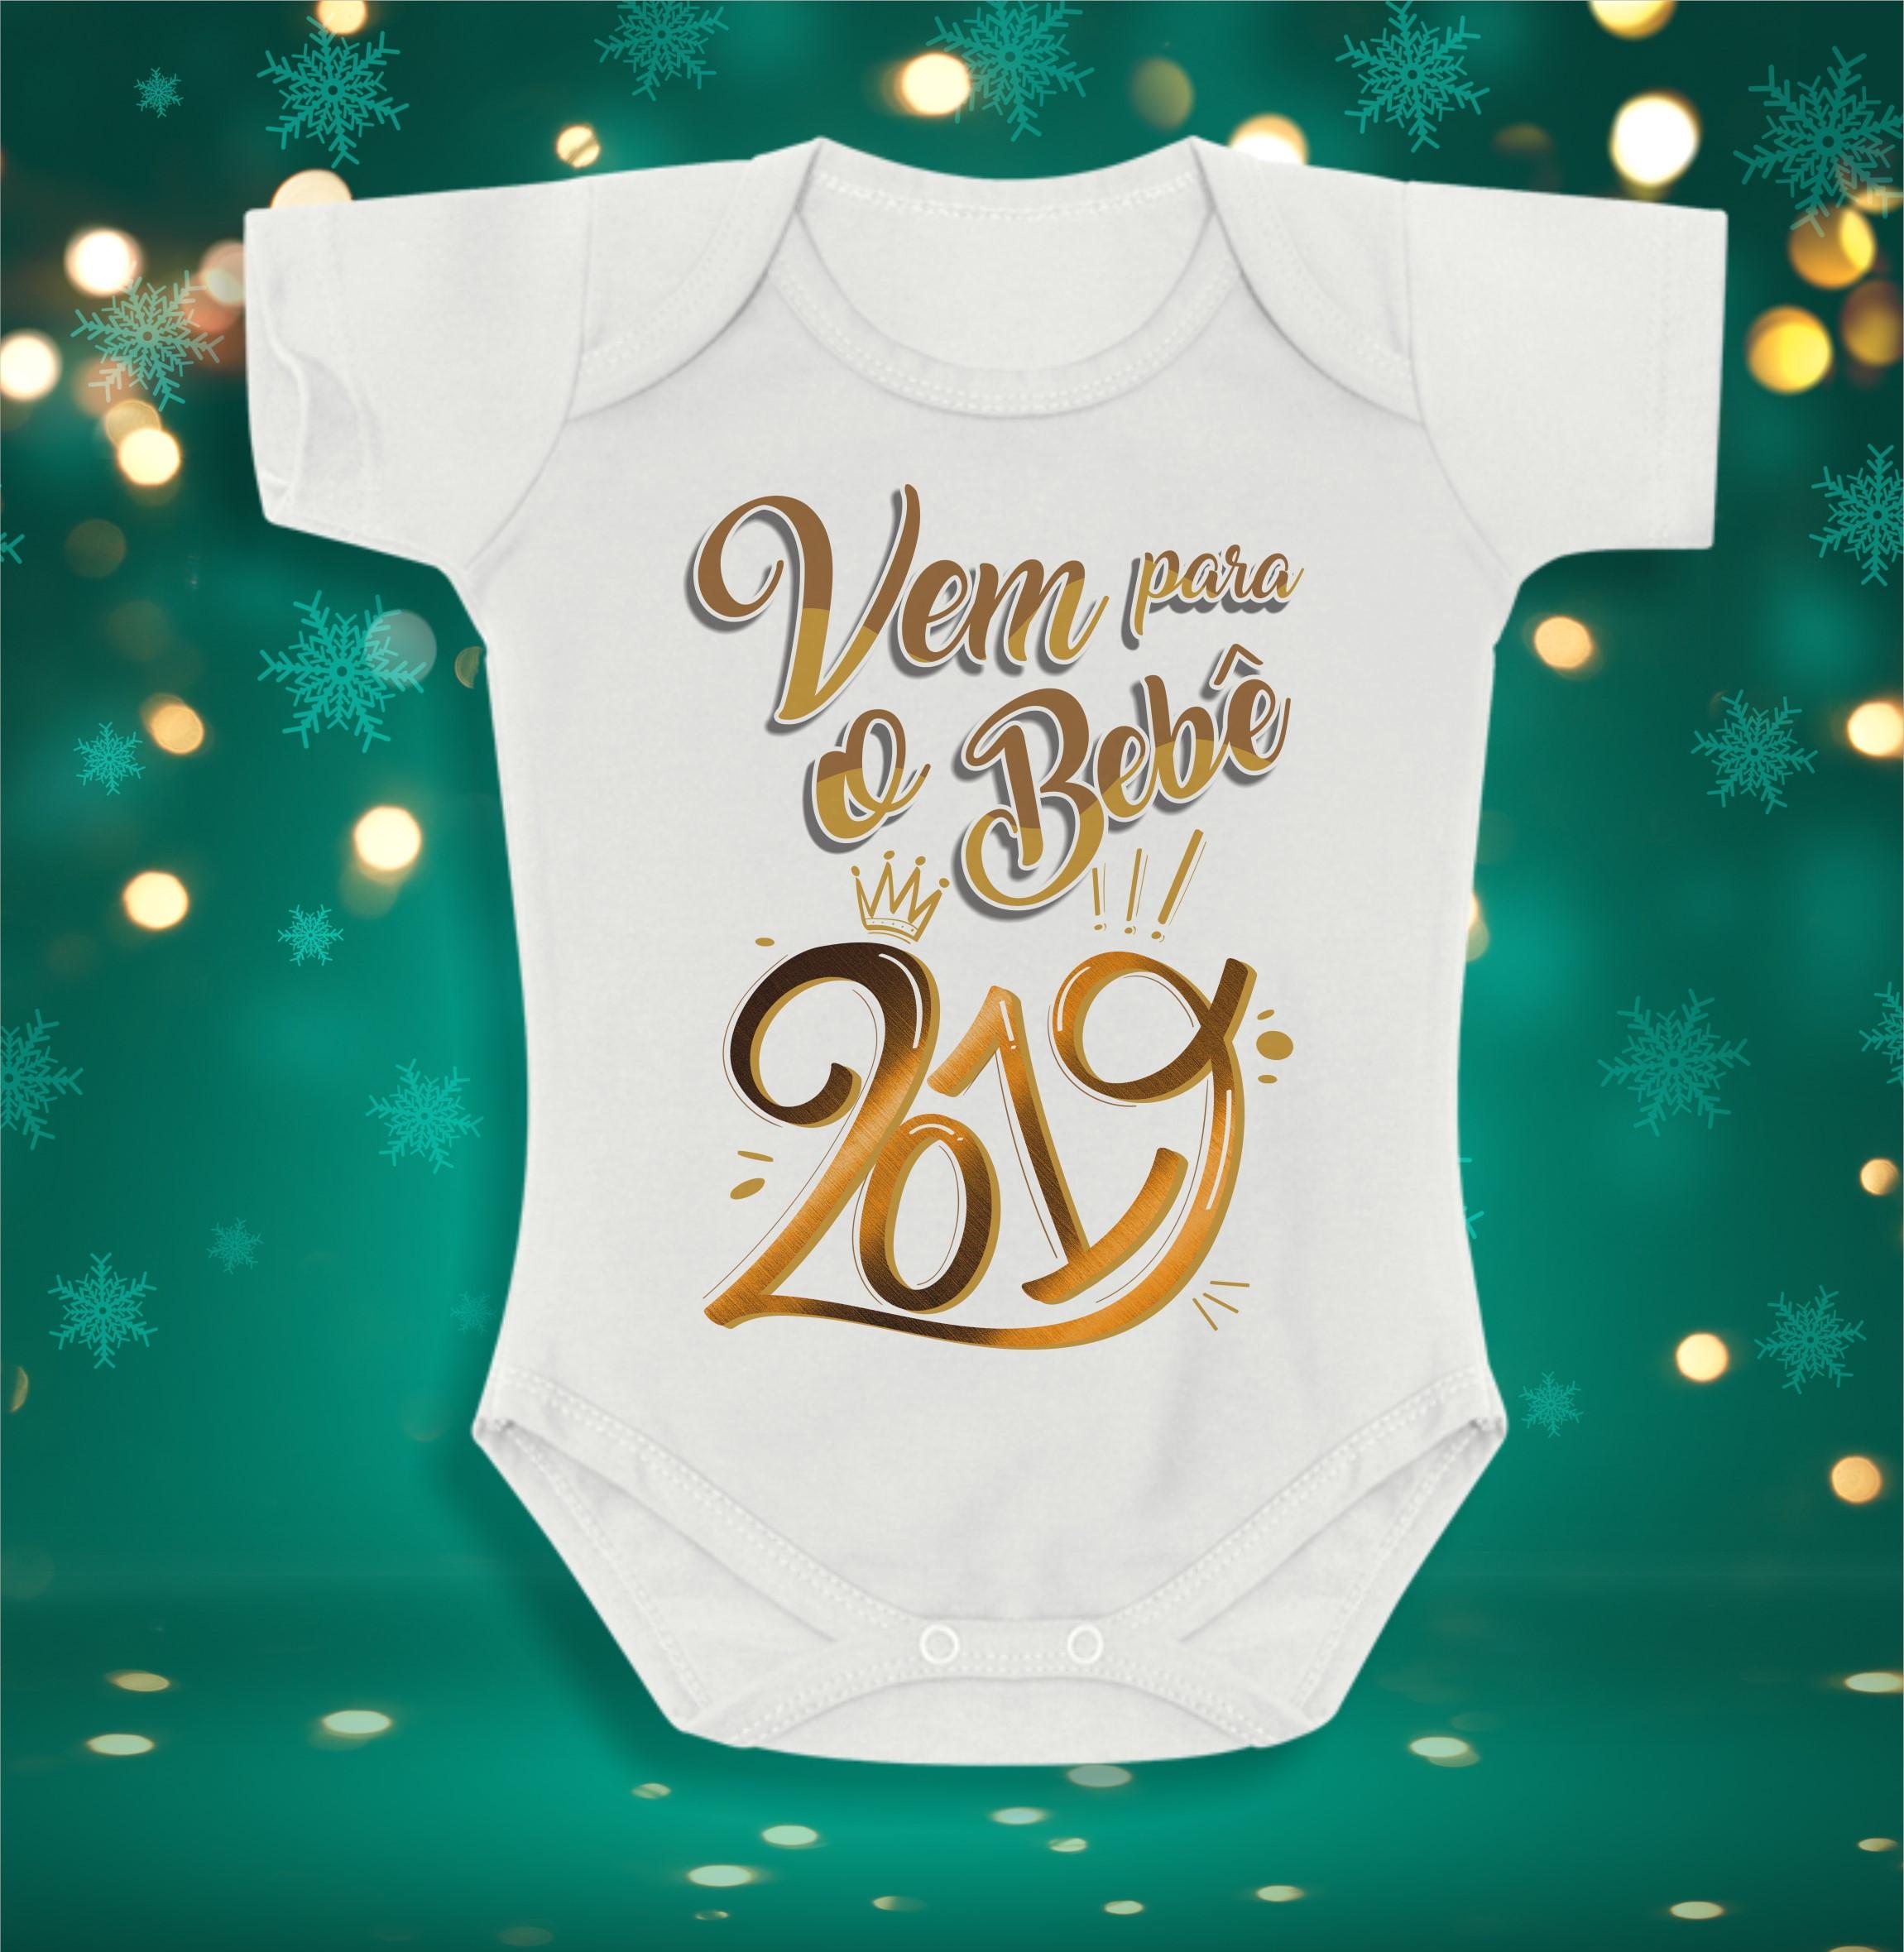 8a8b9024c797 Regata Feminina Ano Novo Reveilon 2019 | Elo7